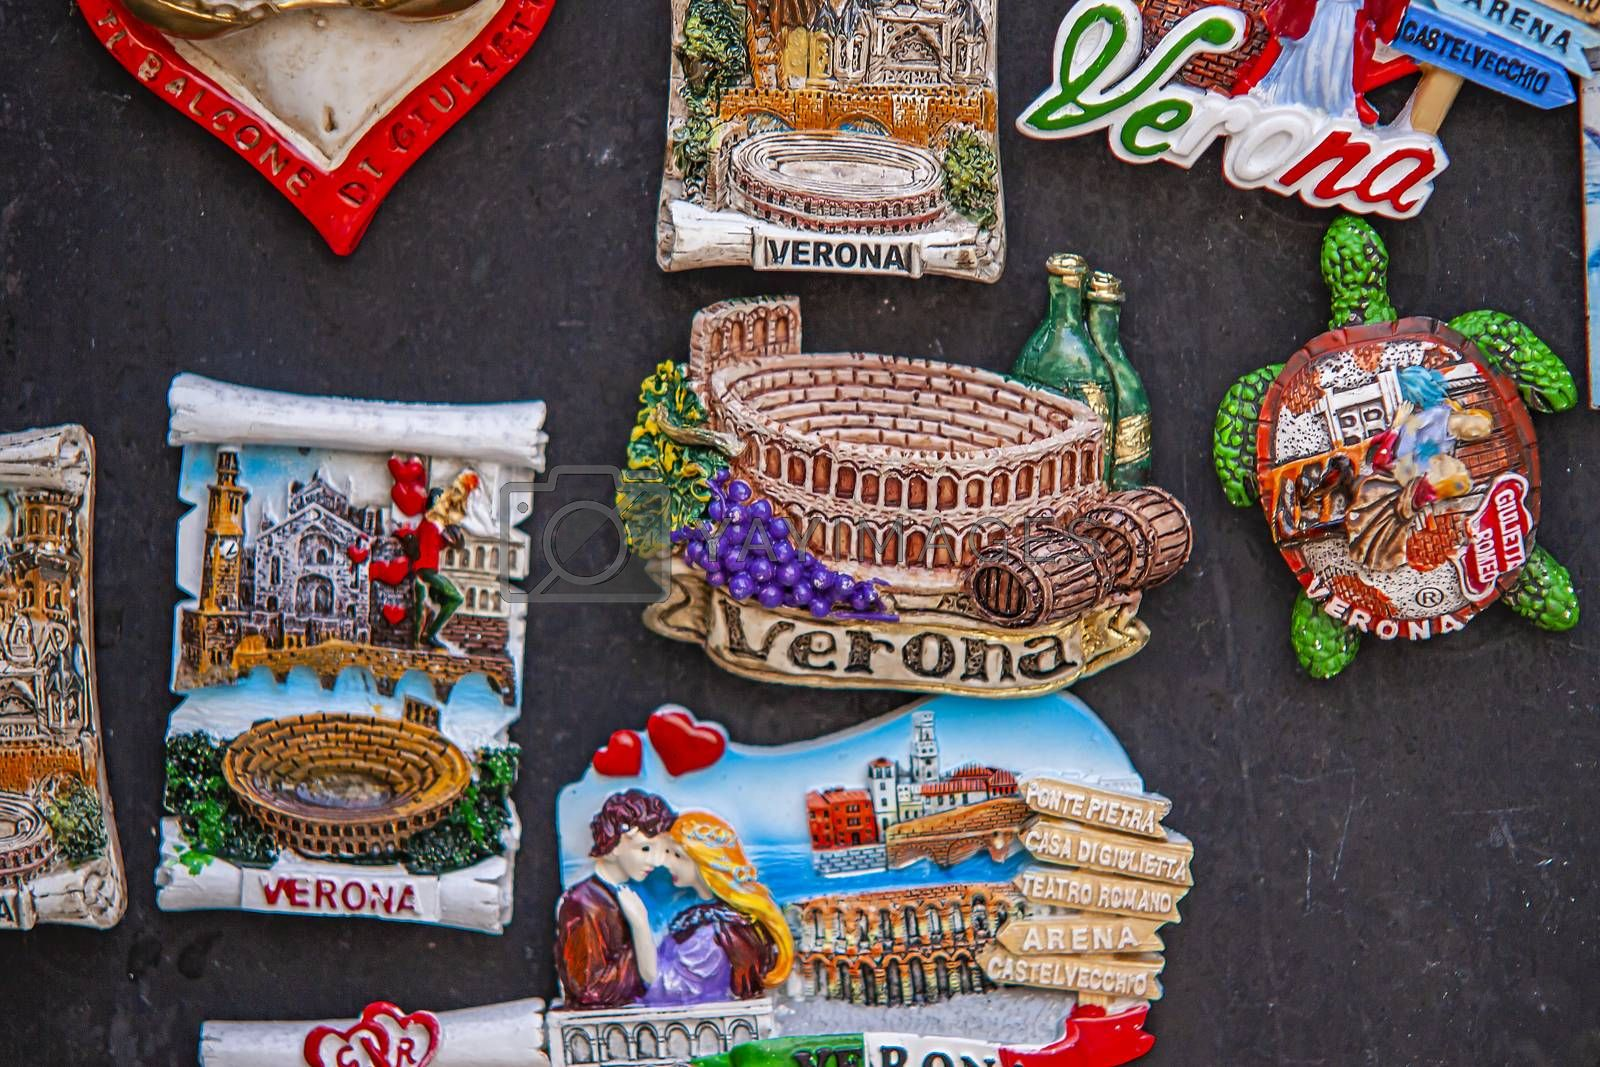 VERONA, ITALY 10 SEPTEMBER 2020: Verona souvenirs detail texture